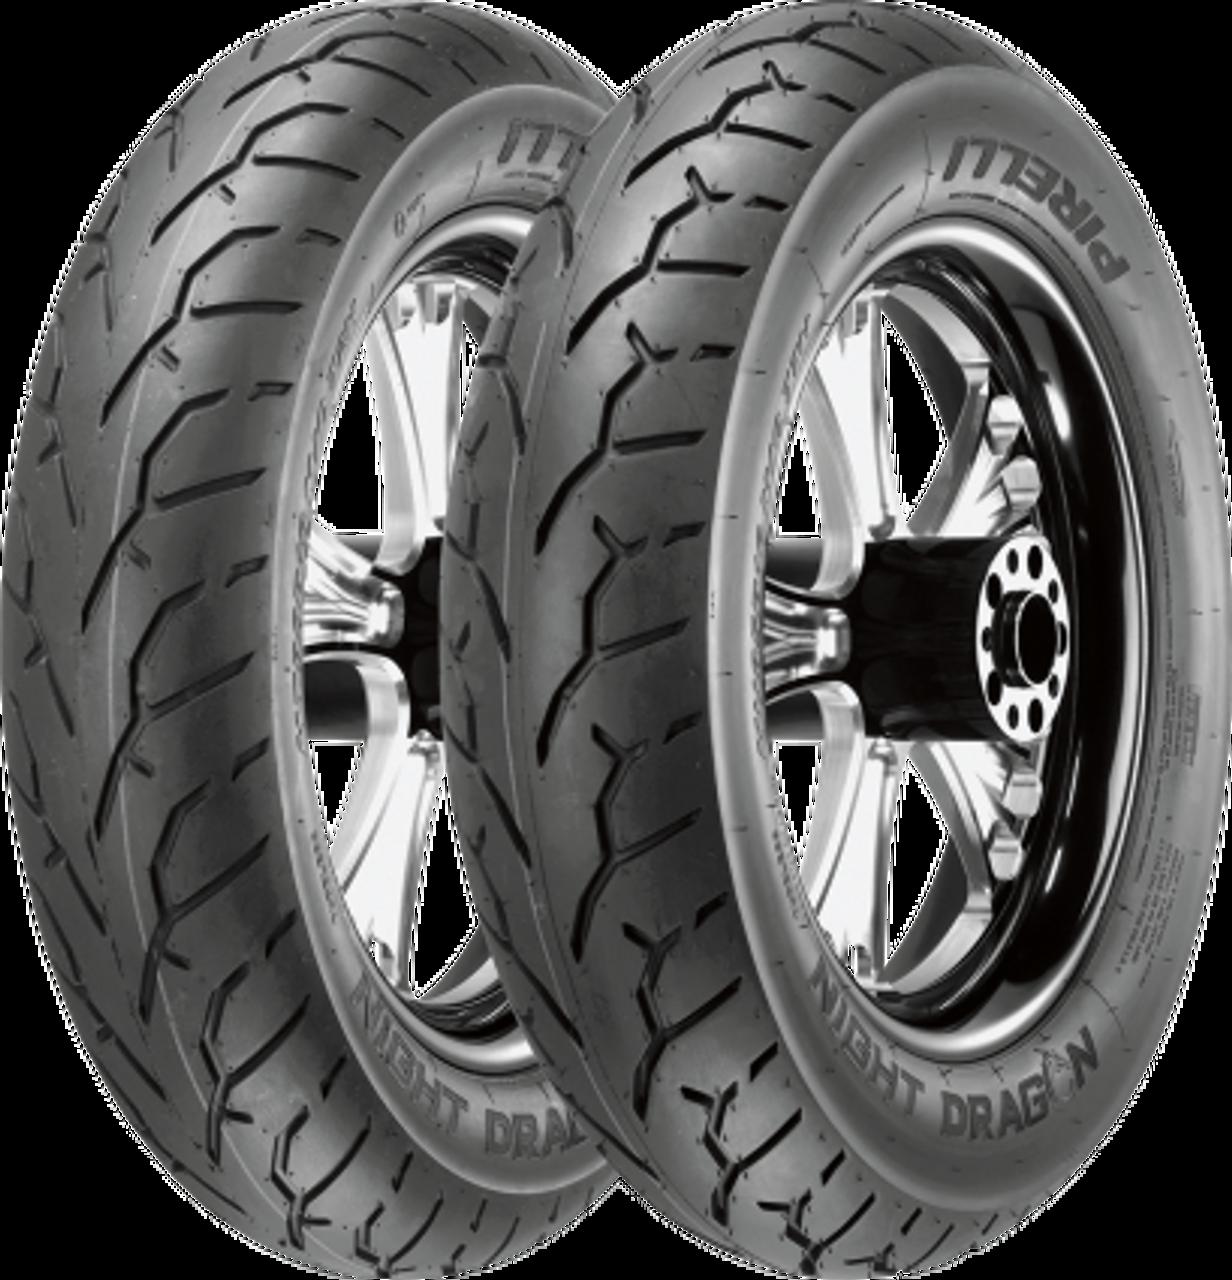 Pirelli Night Dragon 240 40r18 Rear Tire